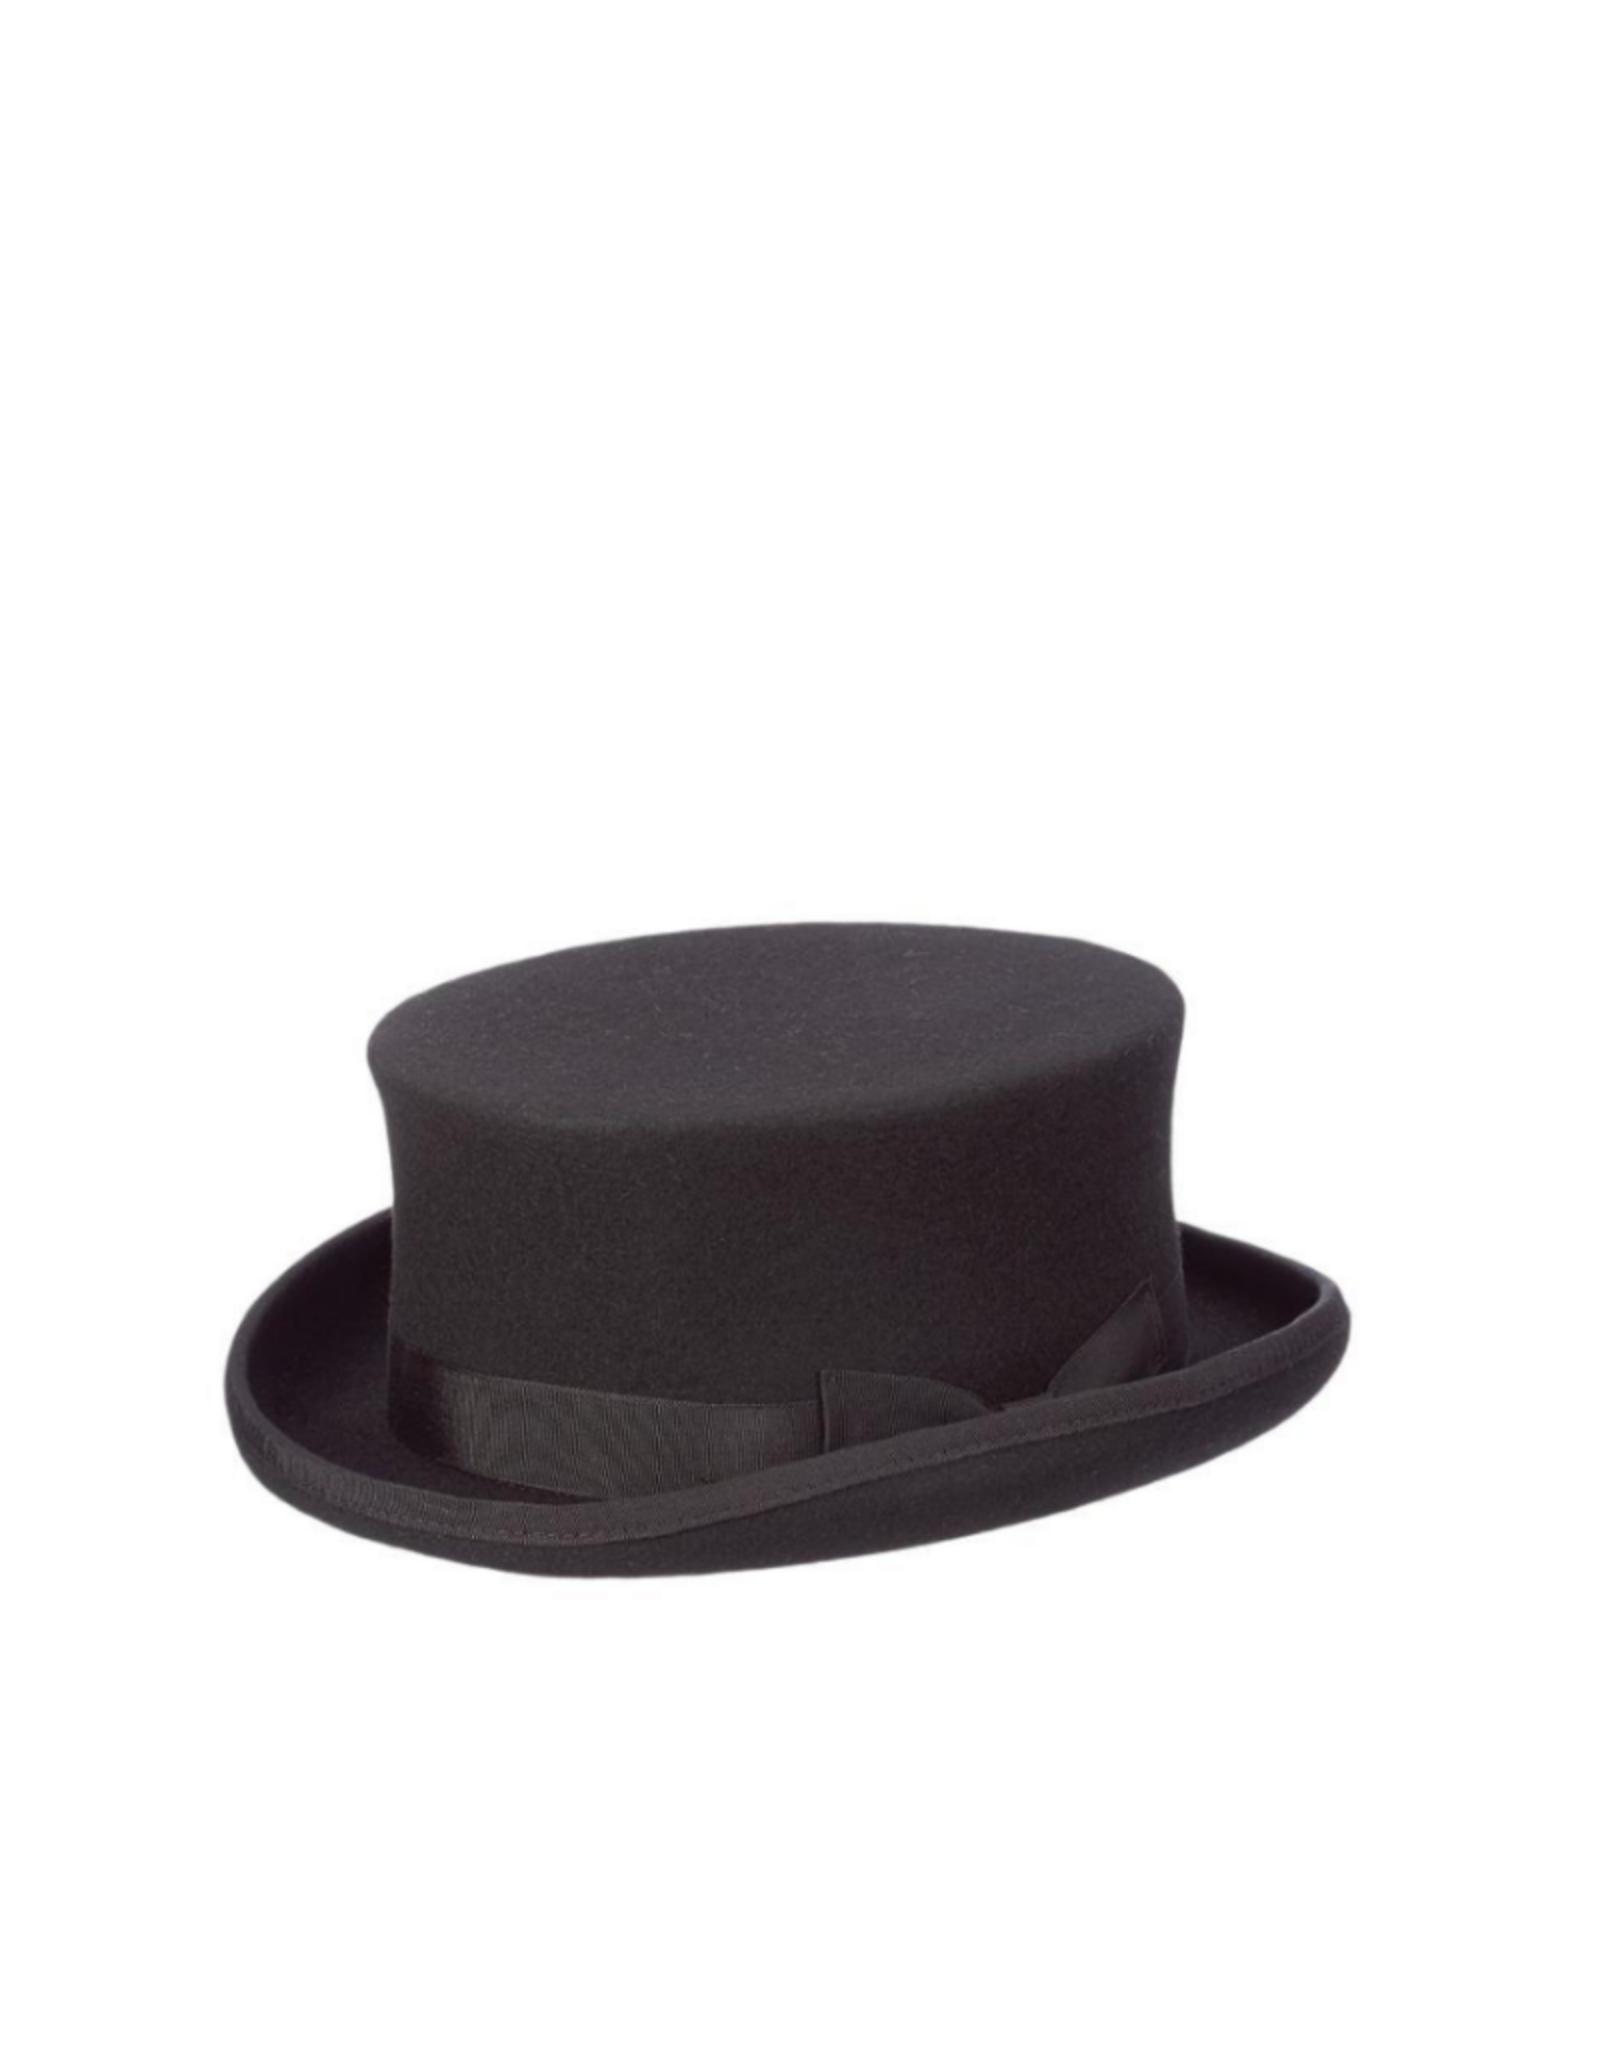 HAT-TOP HAT-HARWICK,  SHORT STEAM PUNK, BLACK, MEDIUM